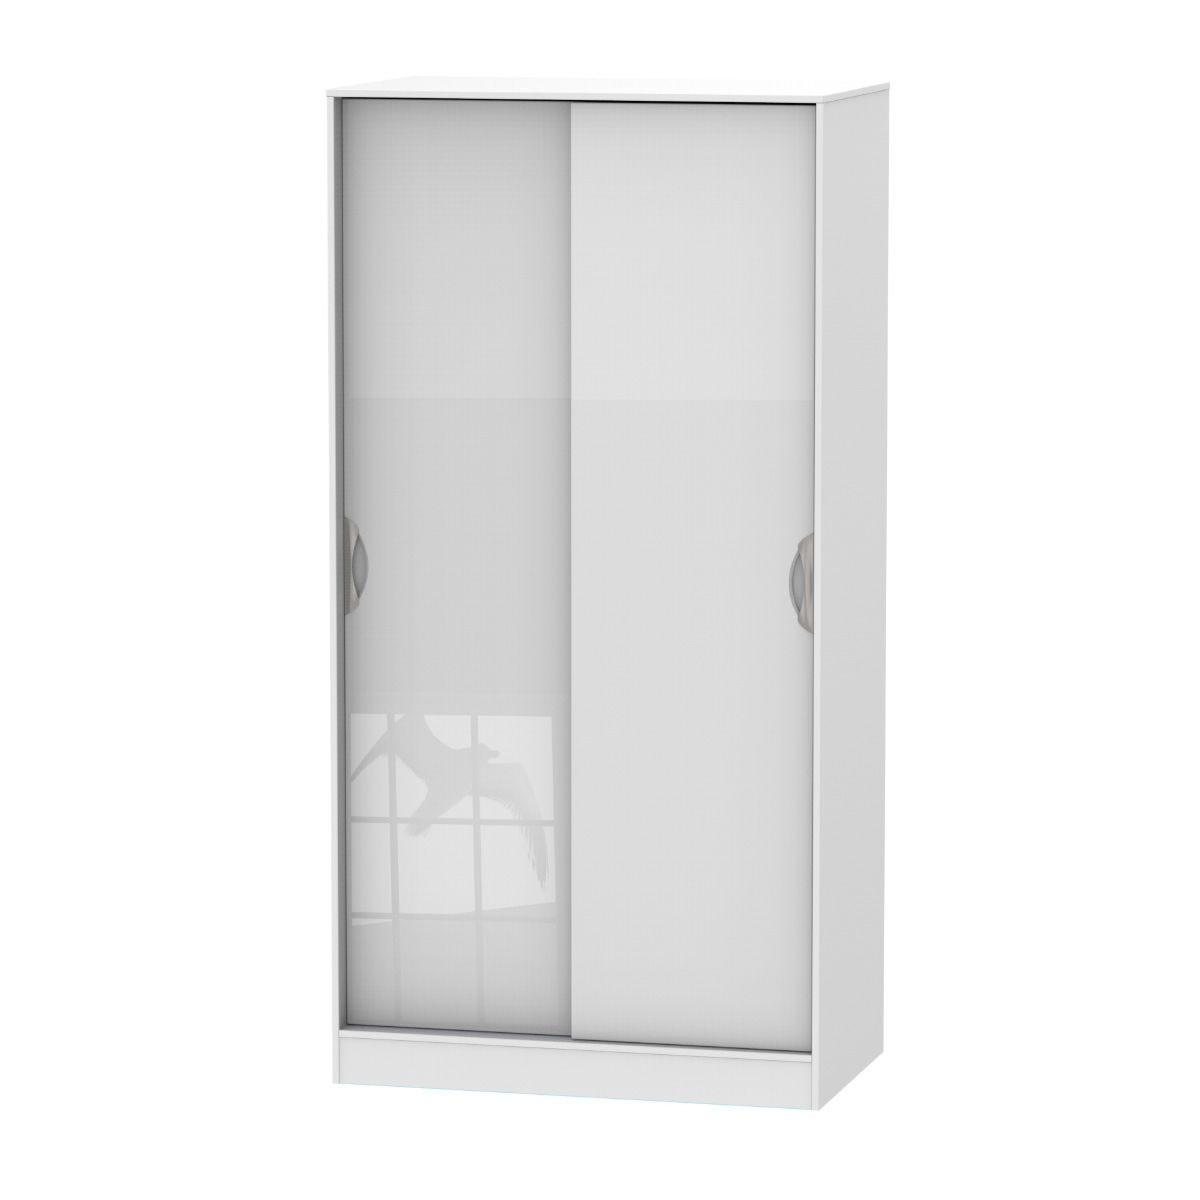 Indices Ready Assembled Sliding Door Robe Dresser - White